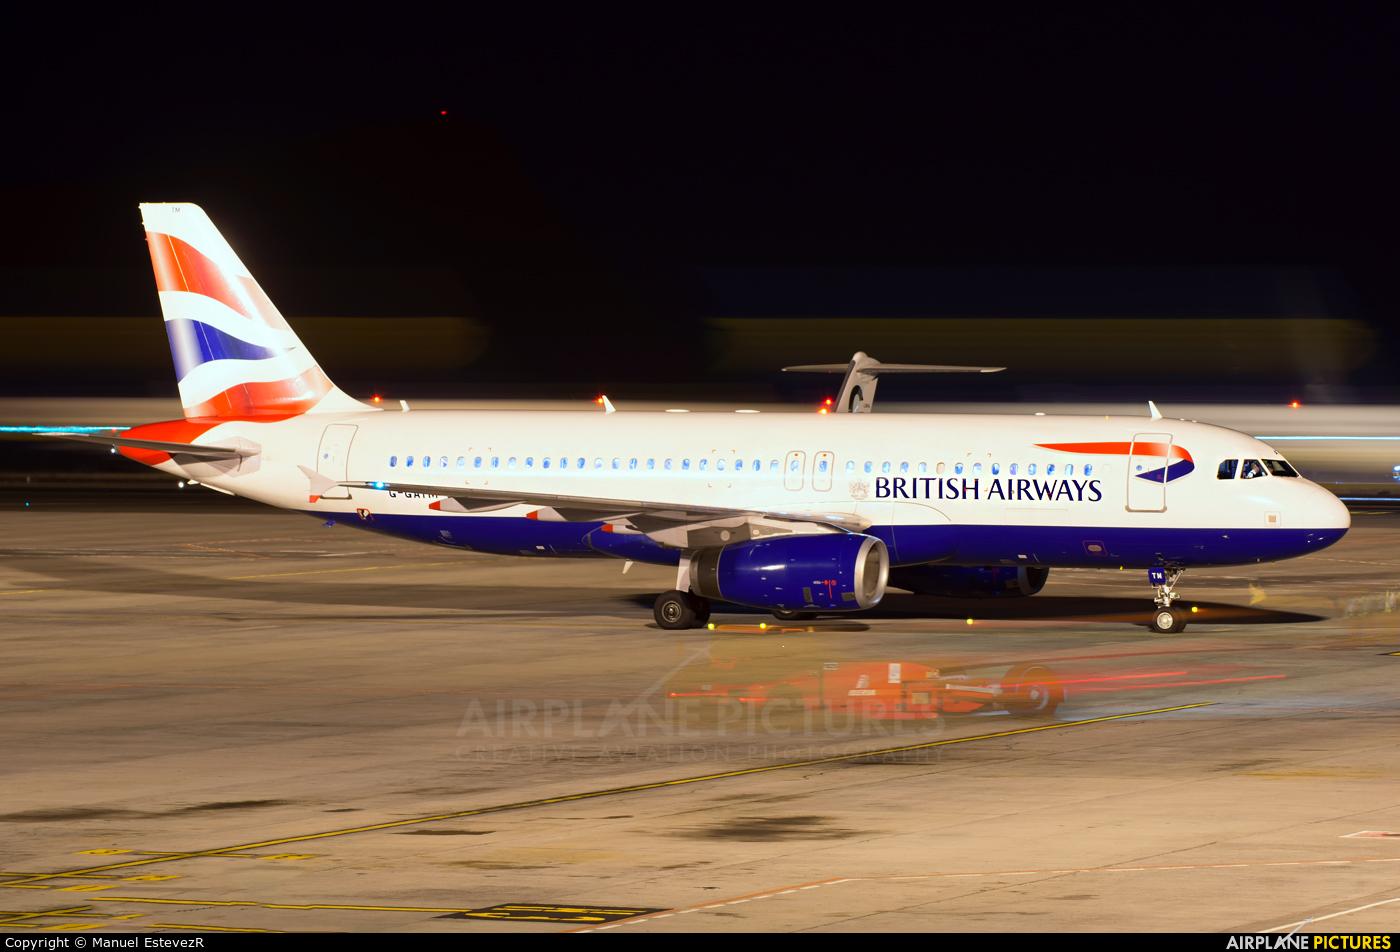 British Airways G-GATM aircraft at Tenerife Sur - Reina Sofia